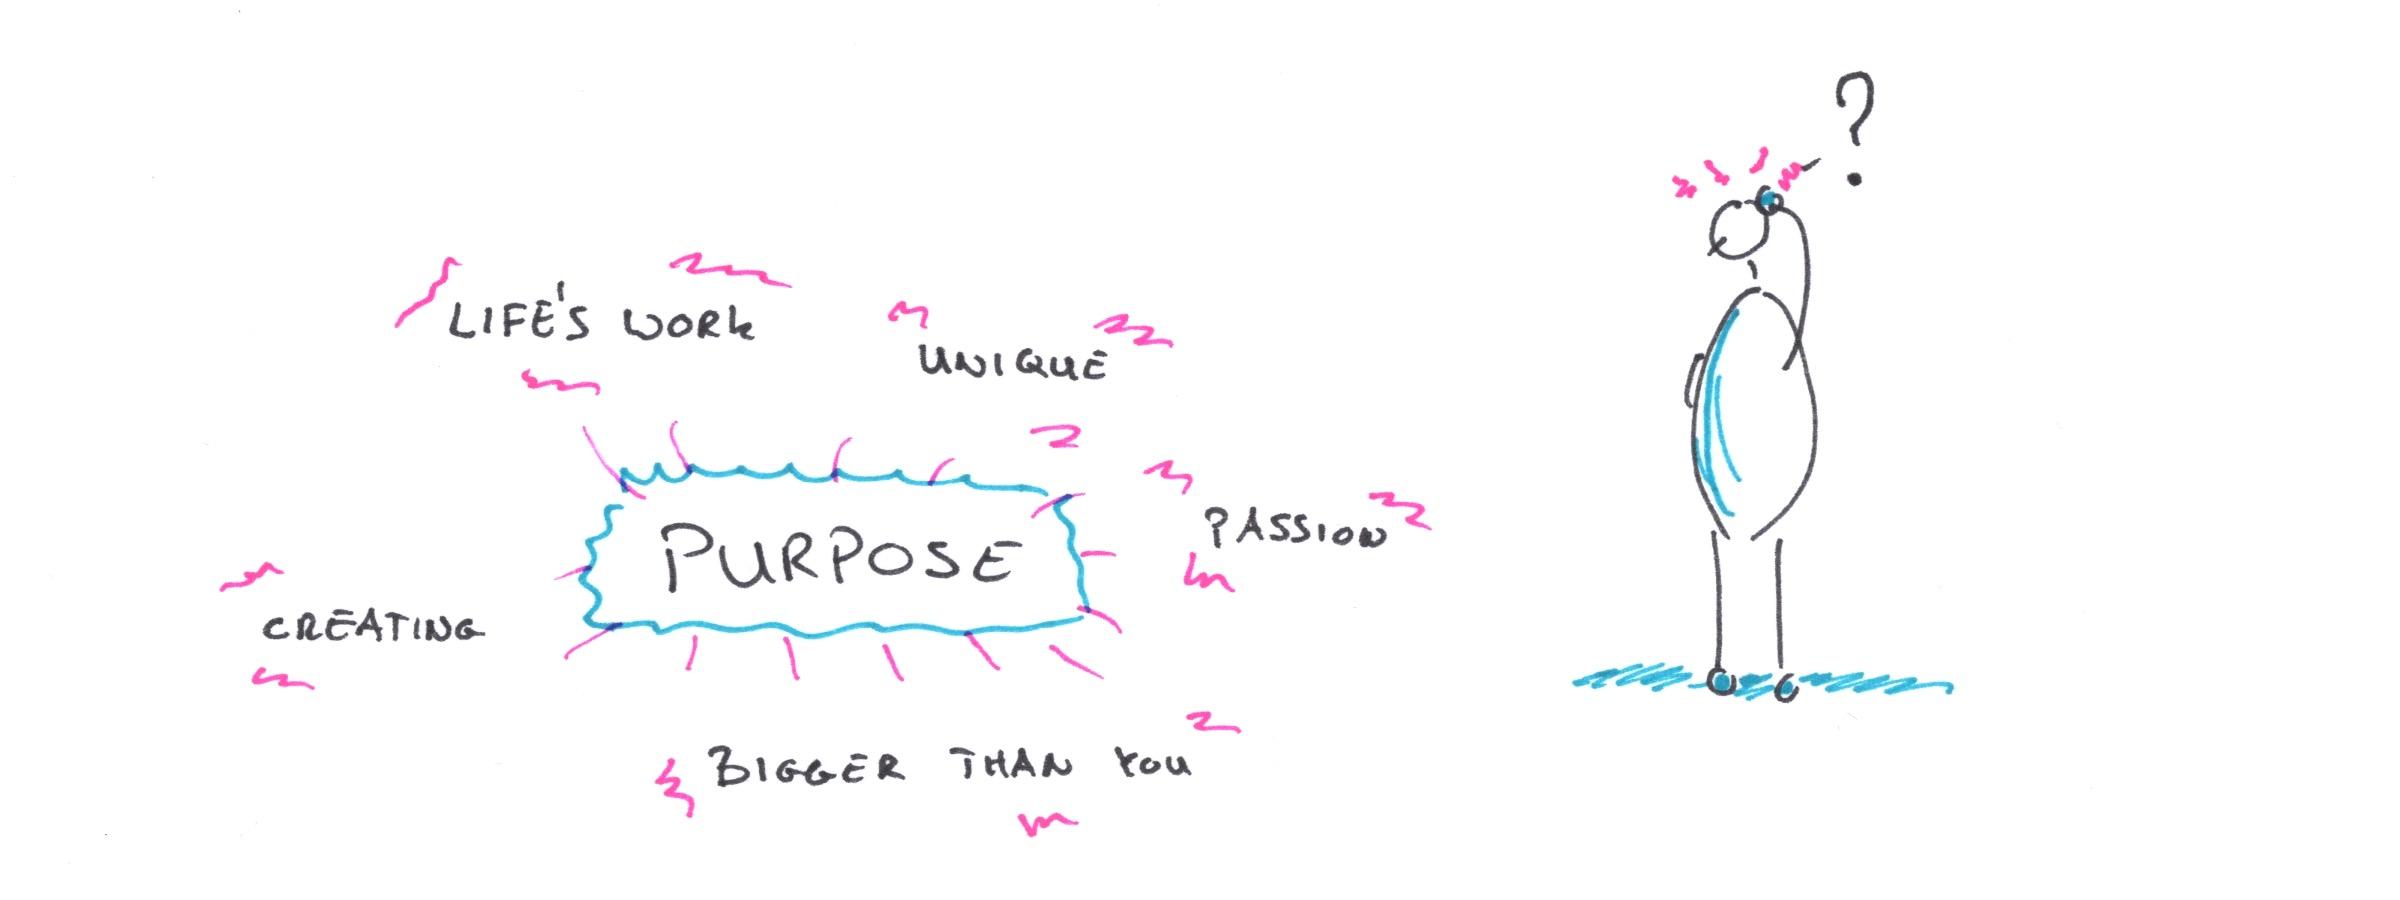 Purpose Model 1.jpeg